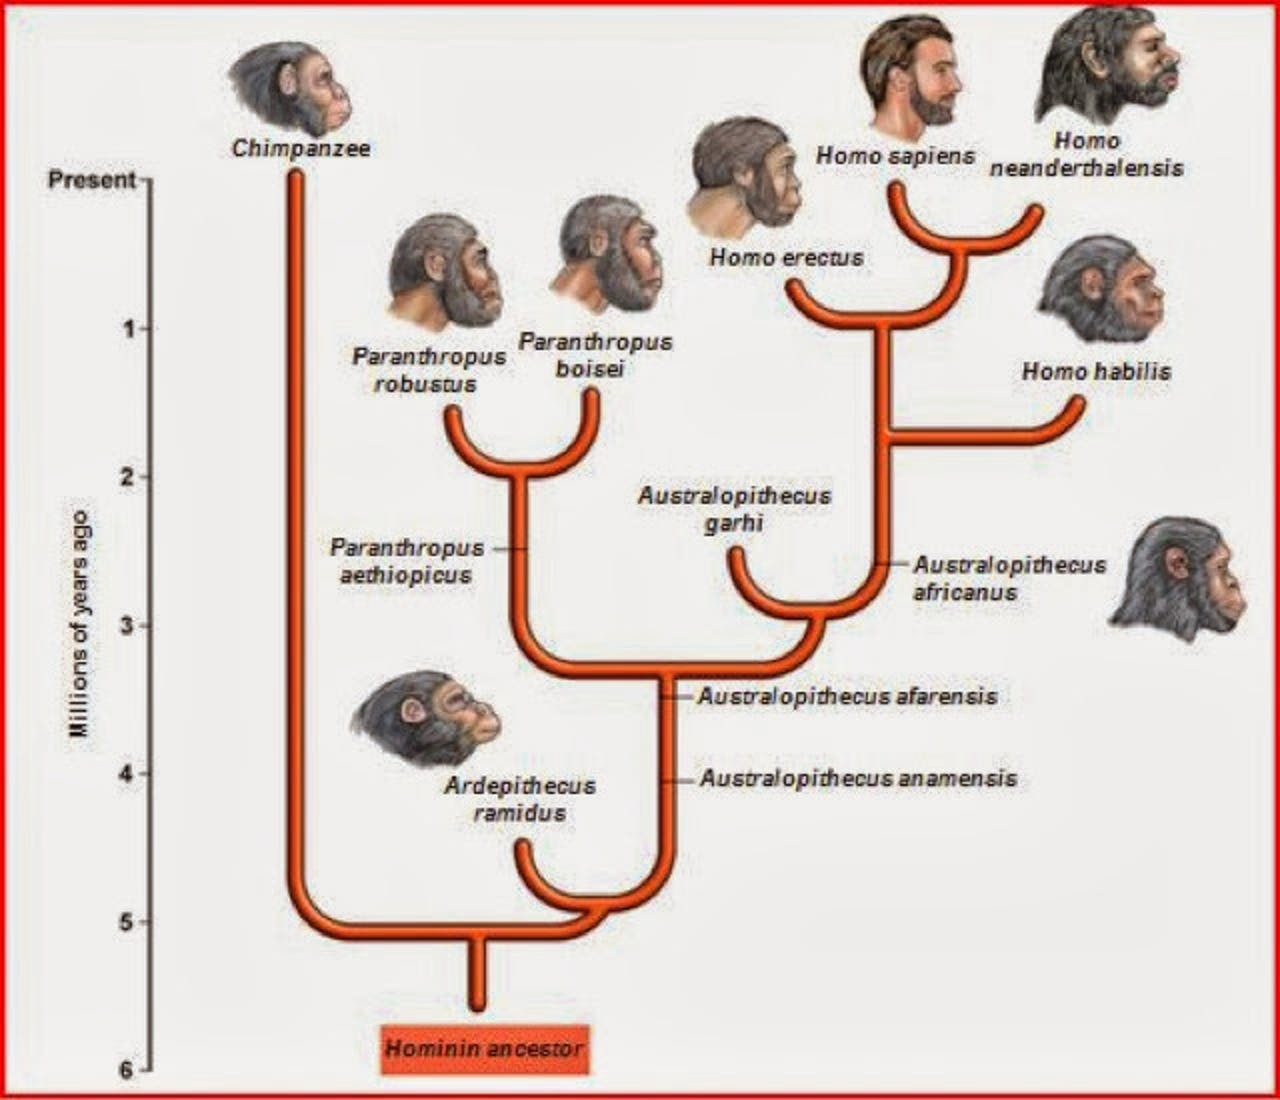 timeline human evolution homo hominin erectus habilis sapiens neandarthalensis neandarthal